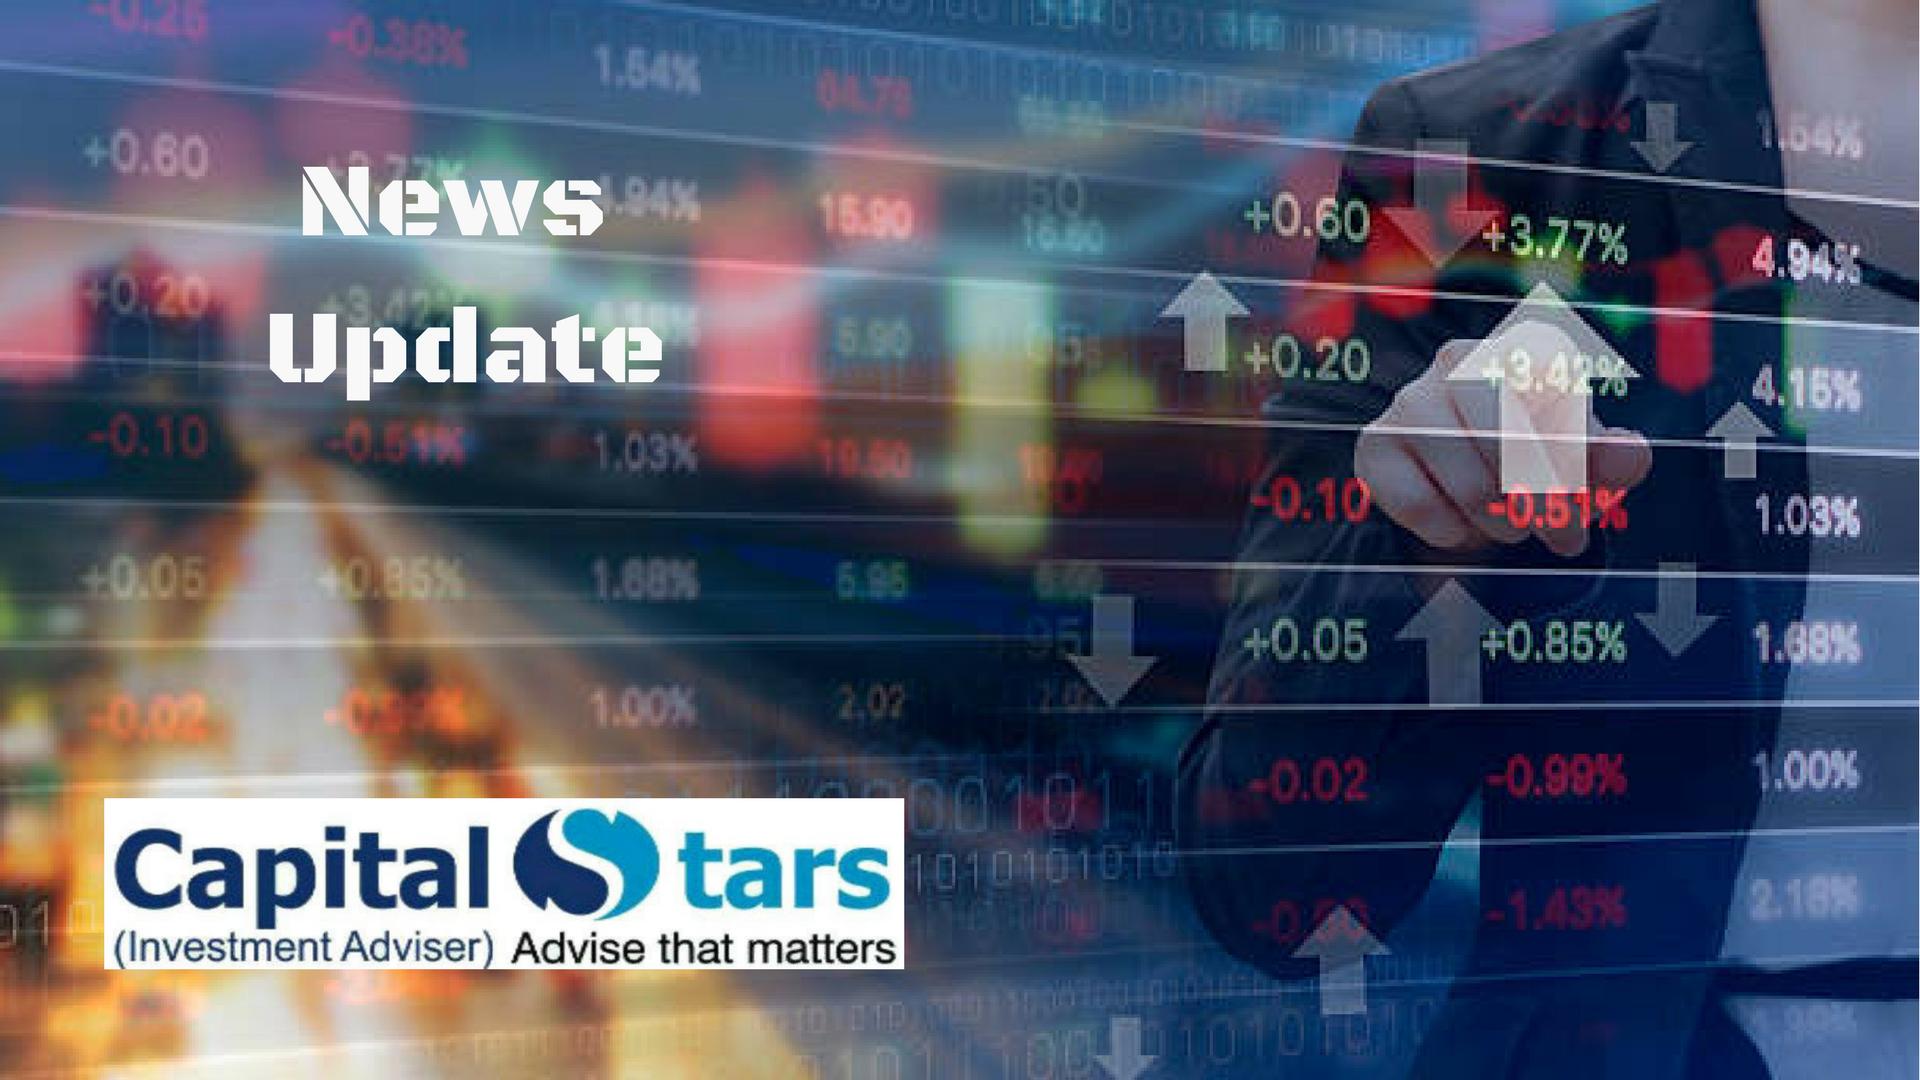 CAPITALSTARS NEWS UPDATE 10 stocks with highest EPS